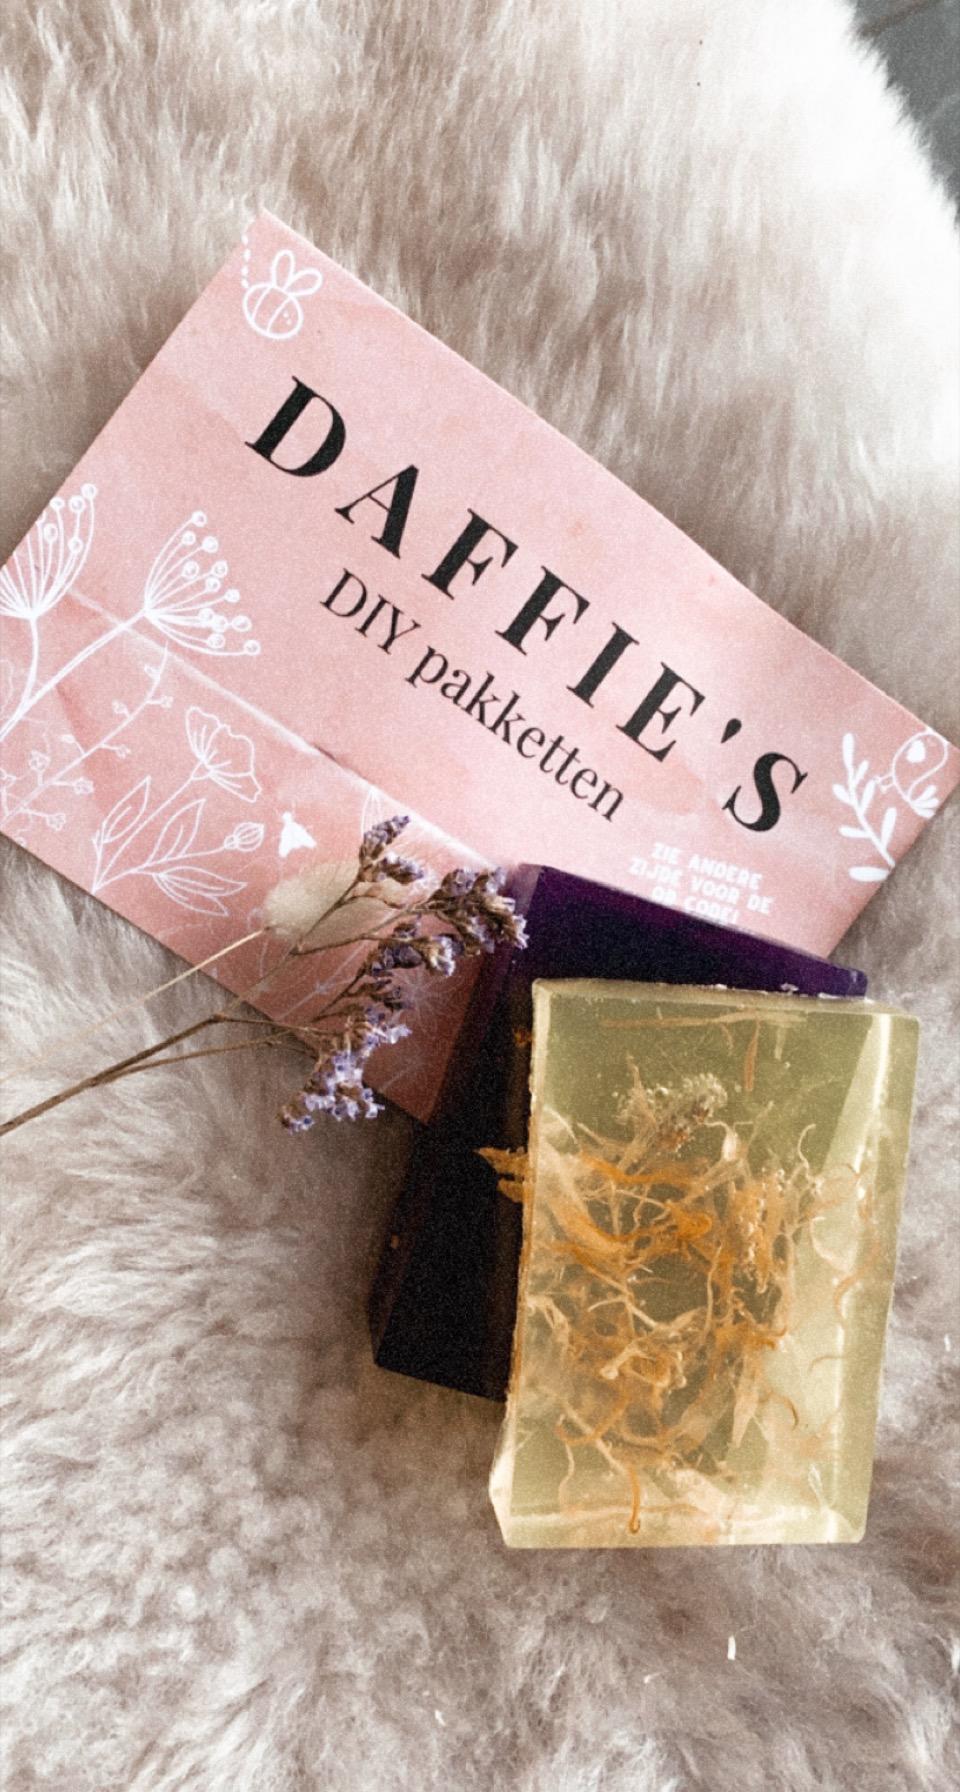 Daffie's DIY